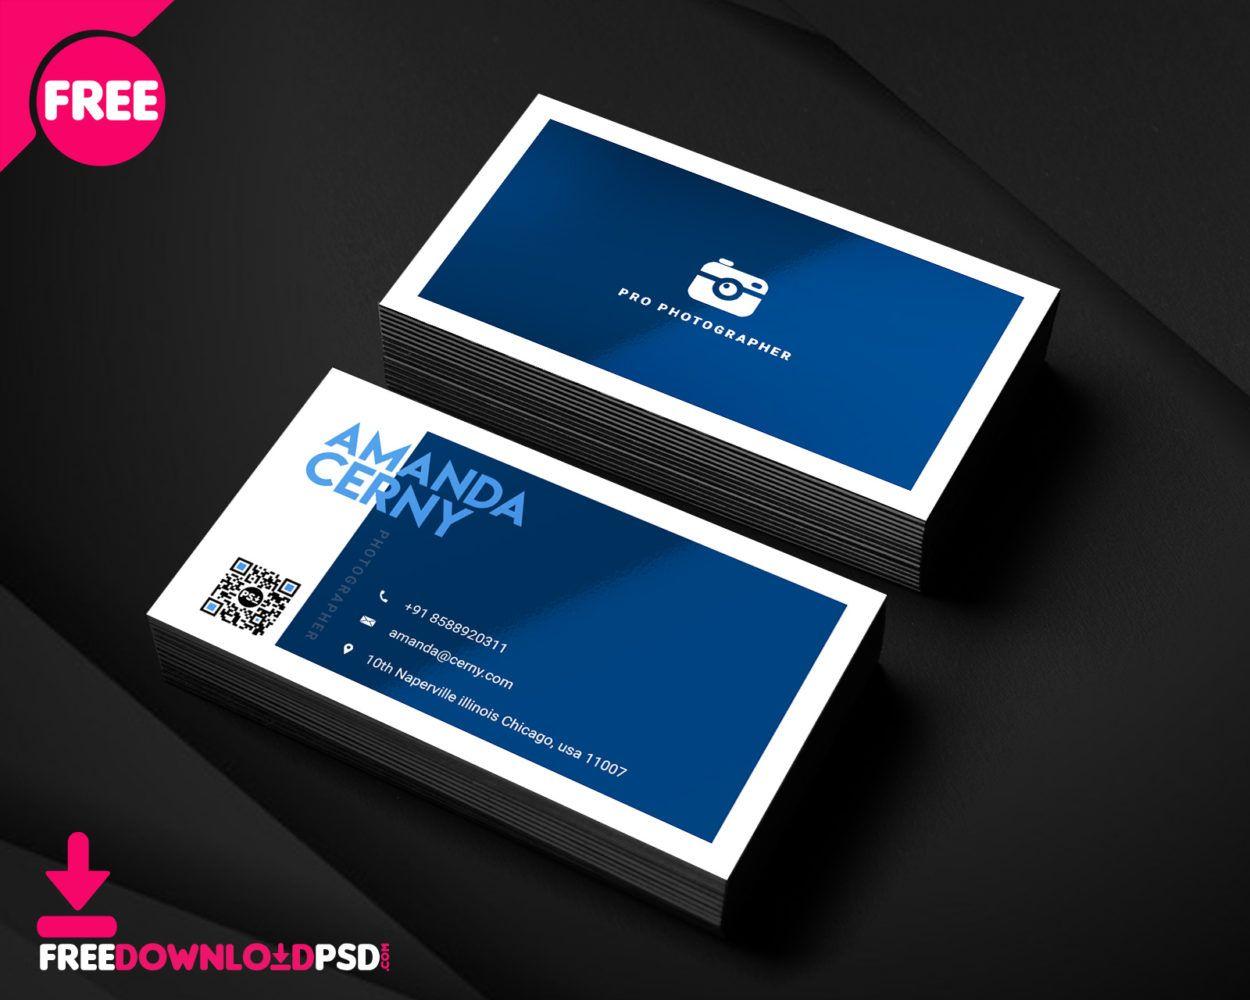 Business Card Templates For Gimp 2 6 And Gimp 2 8 Wimpy In Gimp Business C In 2020 Printable Business Cards Free Printable Business Cards Business Card Template Word